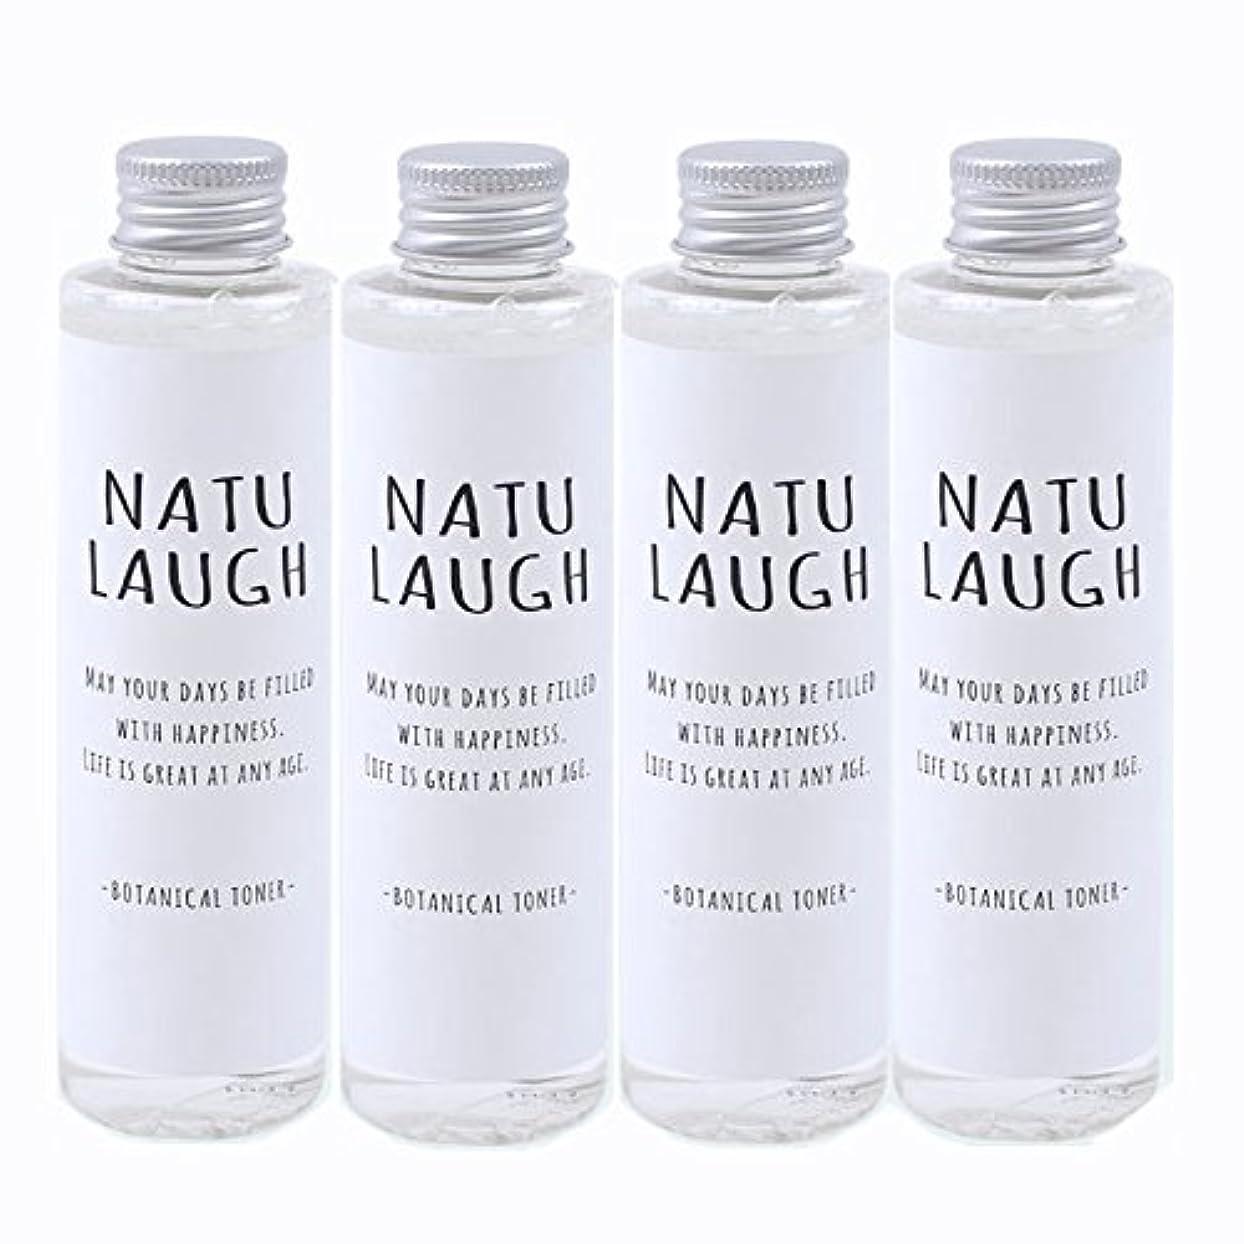 NATU LAUGH ボタニカル 化粧水 150ml - BOTANICAL TONER - (4個)